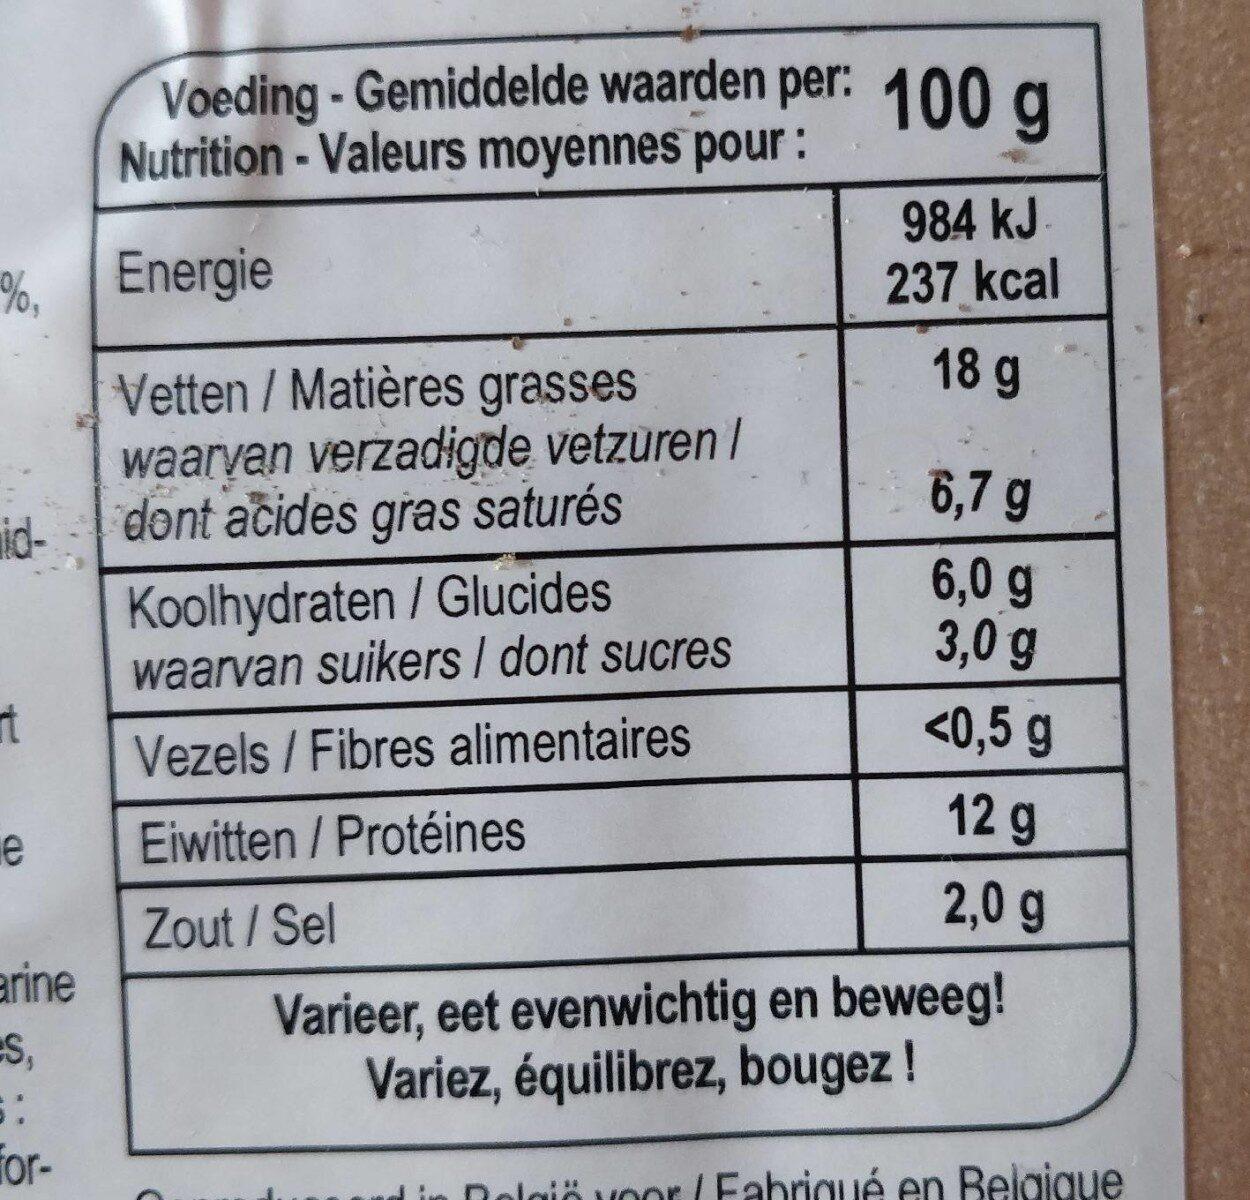 Saucisson au persil - Voedingswaarden